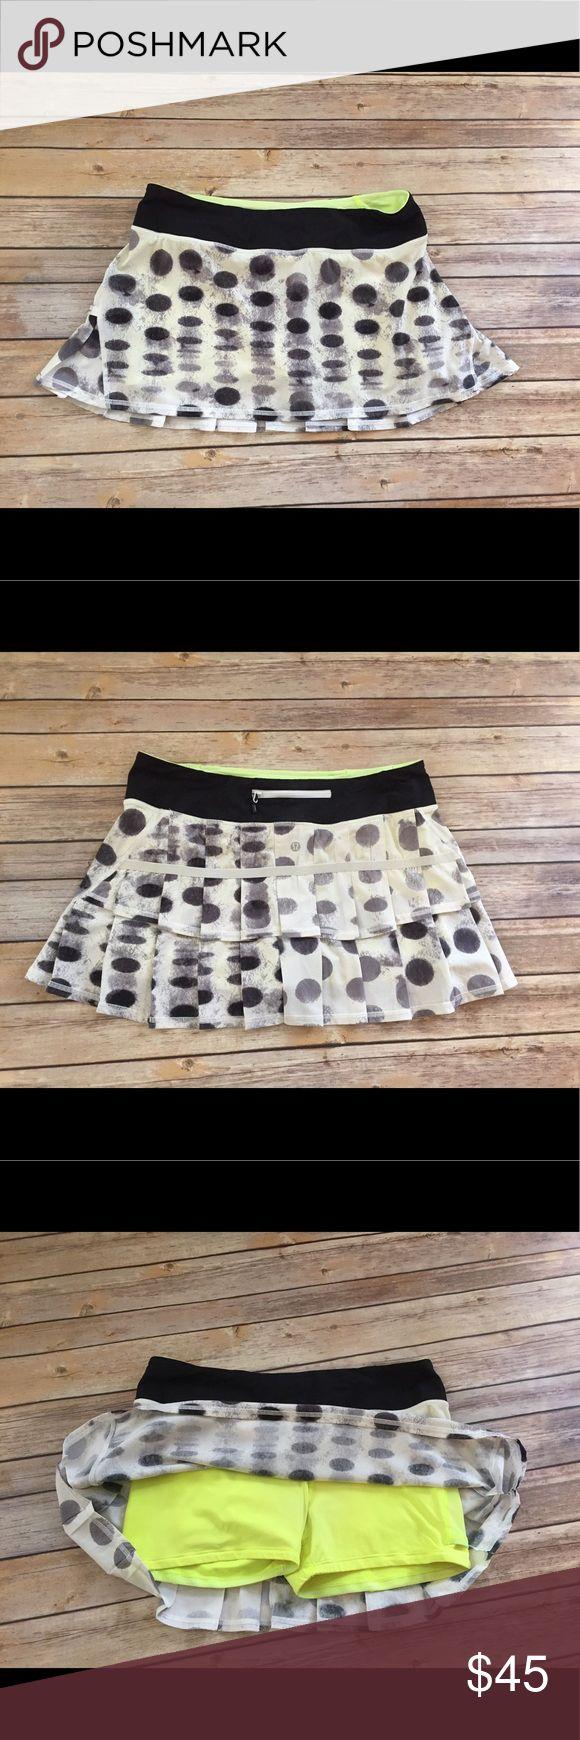 LuLulemon Athletica polkadot tennis skirt LuLulemon Athletica polkadot tennis skirt lululemon athletica Skirts